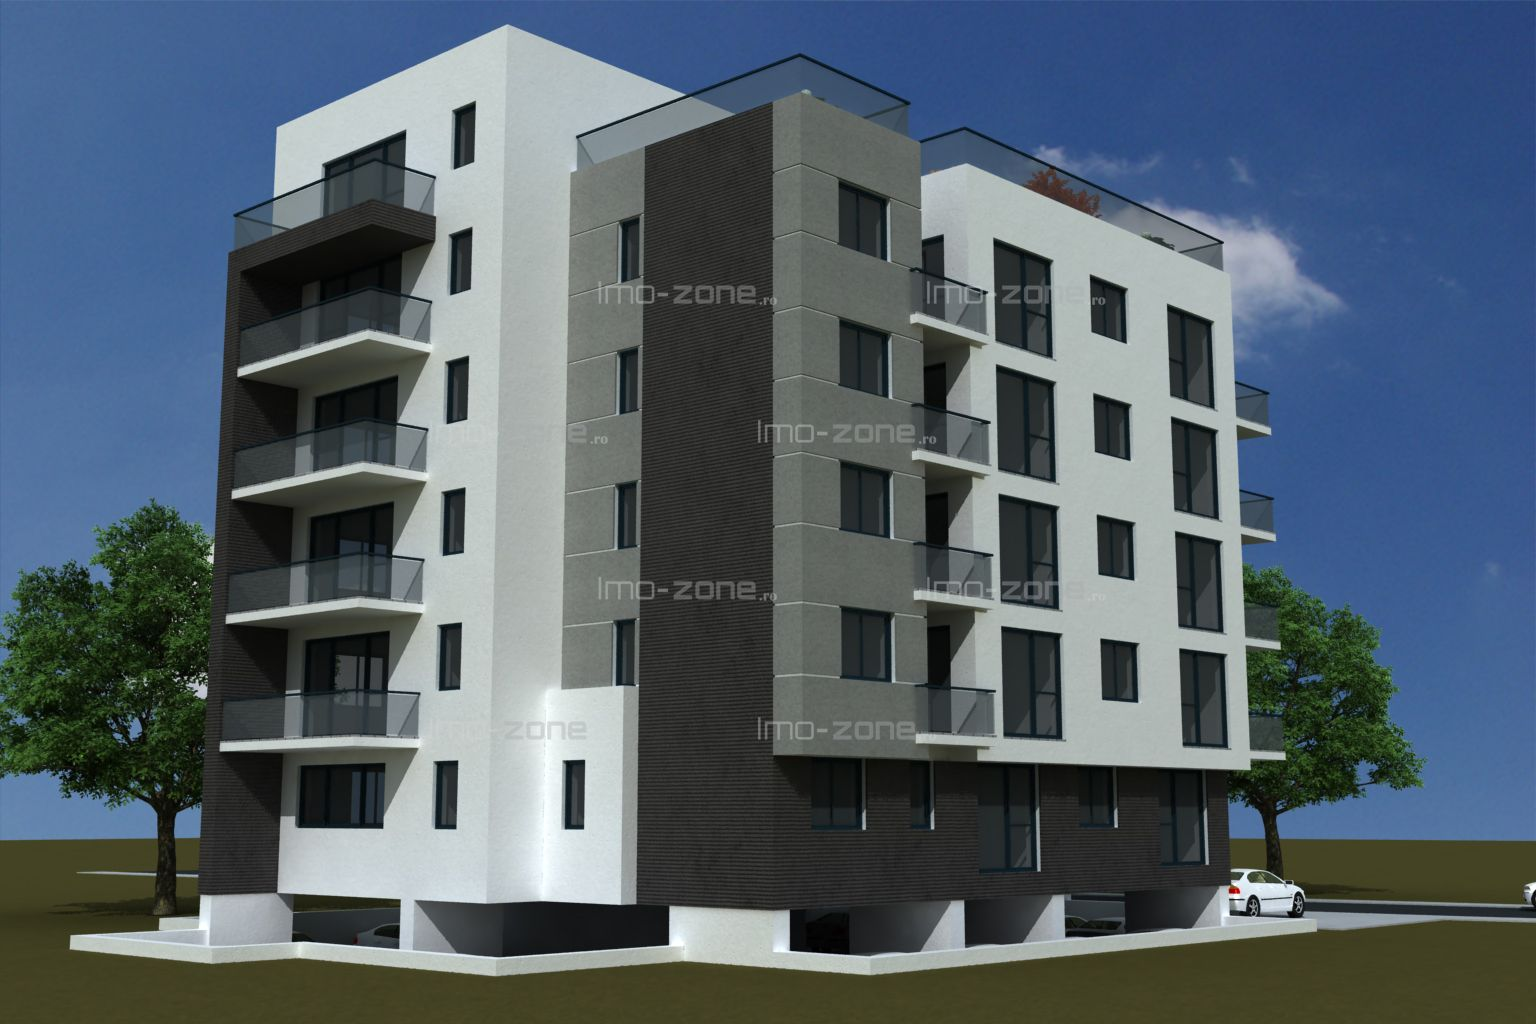 Apartament nou langa PLAZA, 3 camere, decomandat, 2 bai, bucatarie inchisa, lift